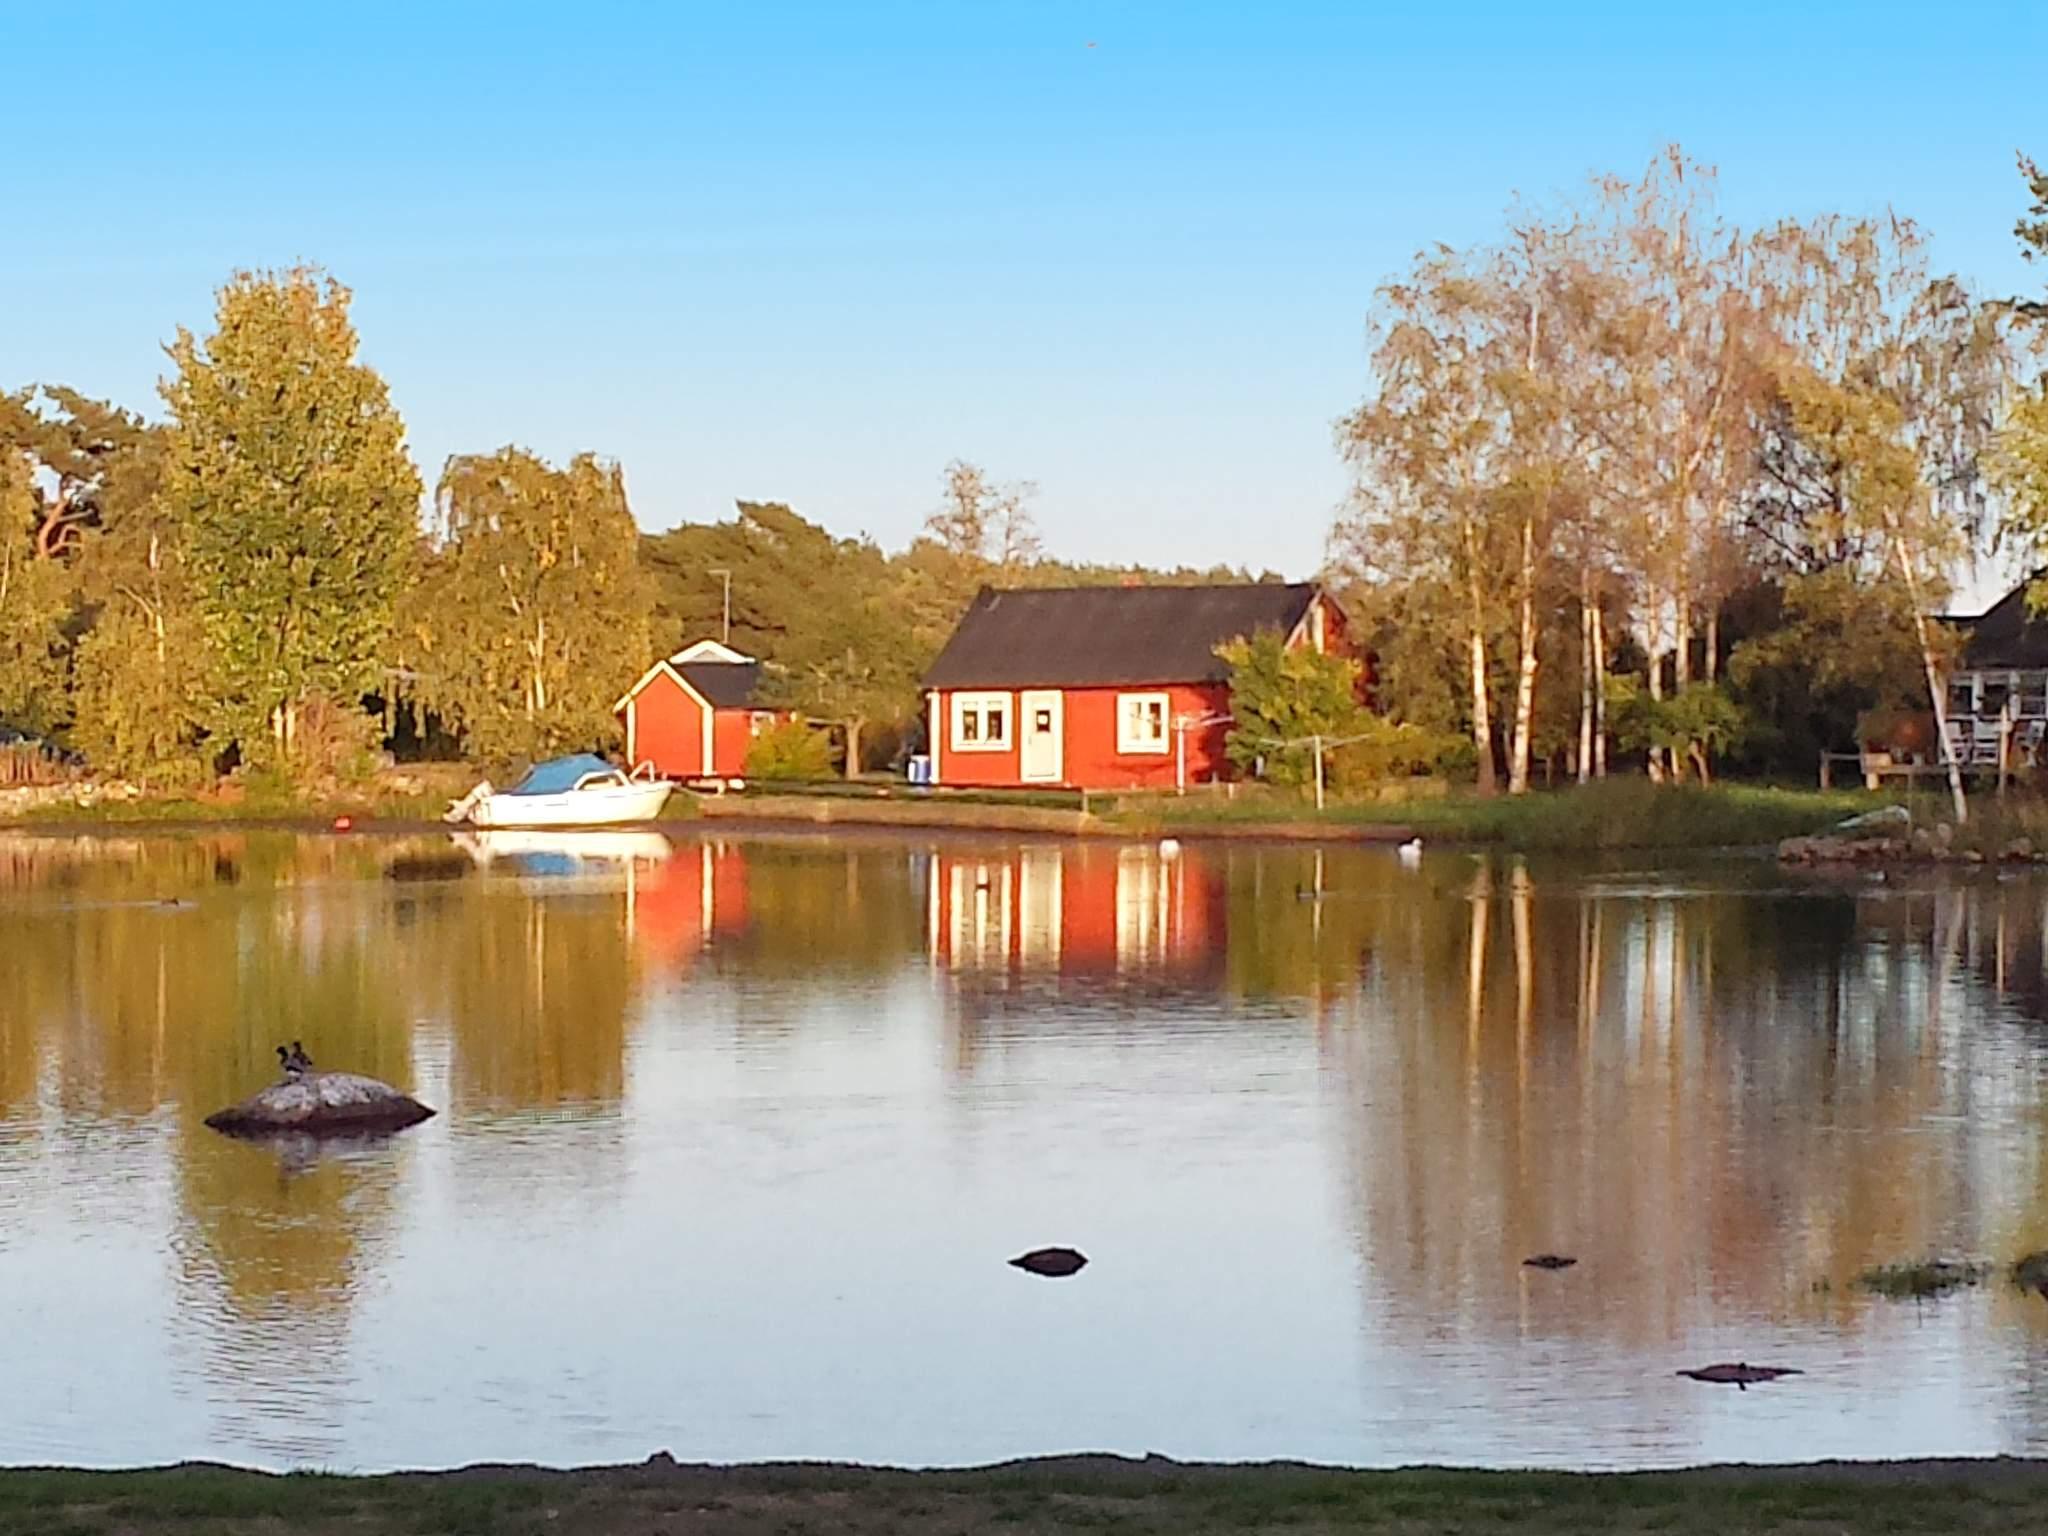 Ferienhaus Bergkvara (257129), Bergkvara, Kalmar län, Südschweden, Schweden, Bild 12